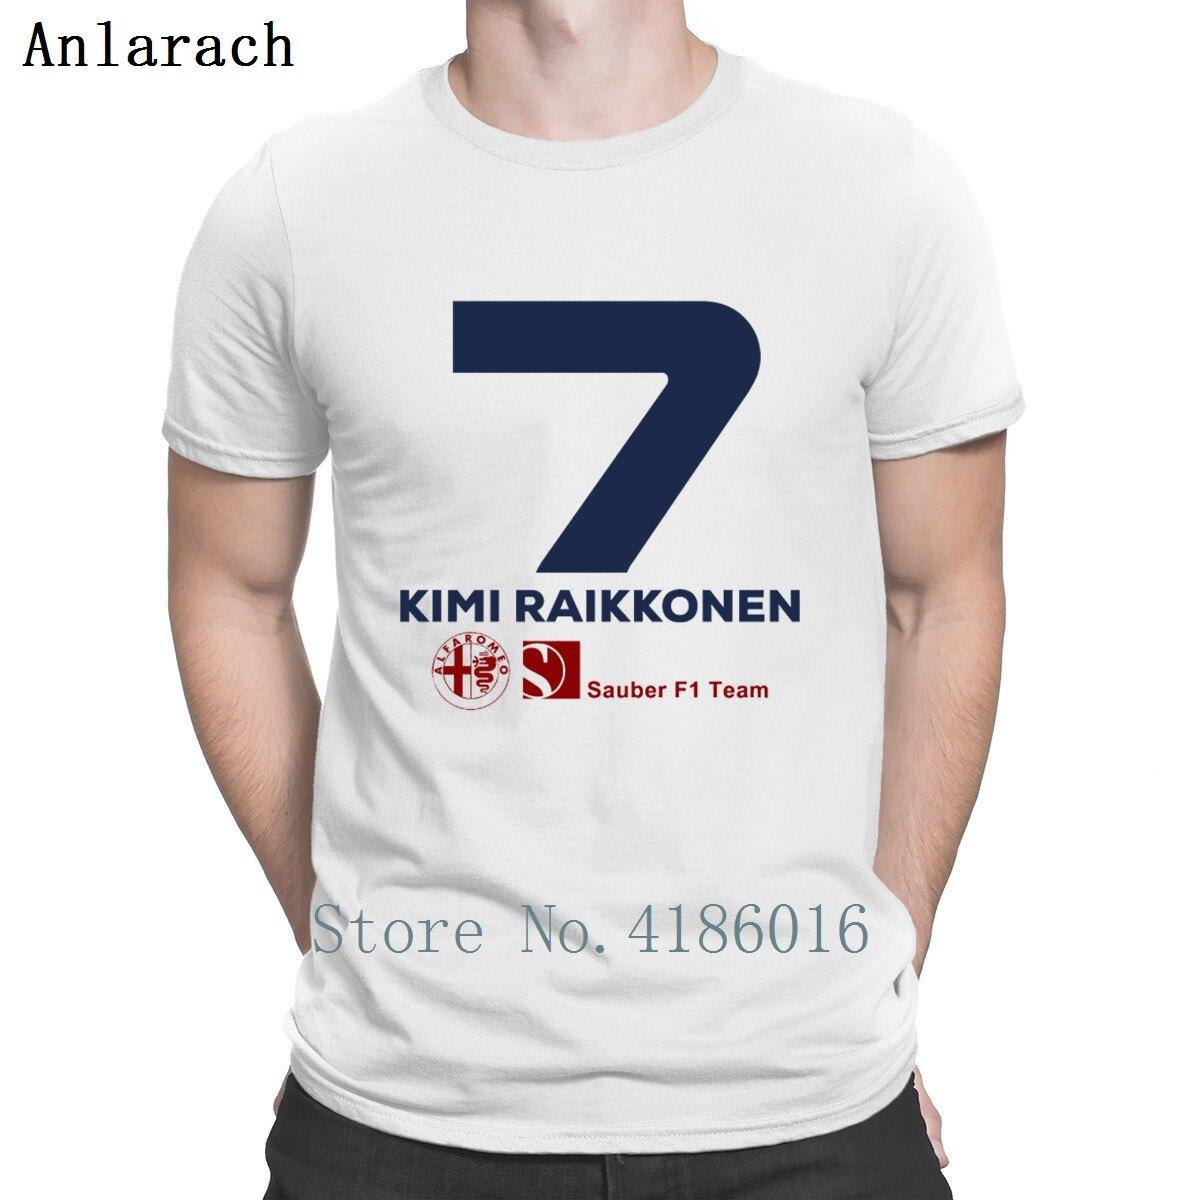 Kimi Raikkonen Sauber F1 2019   T     Shirt   Quirky Personality Streetwear Leisure Hip Hop Summer Style Mens Fashion Humor Fit